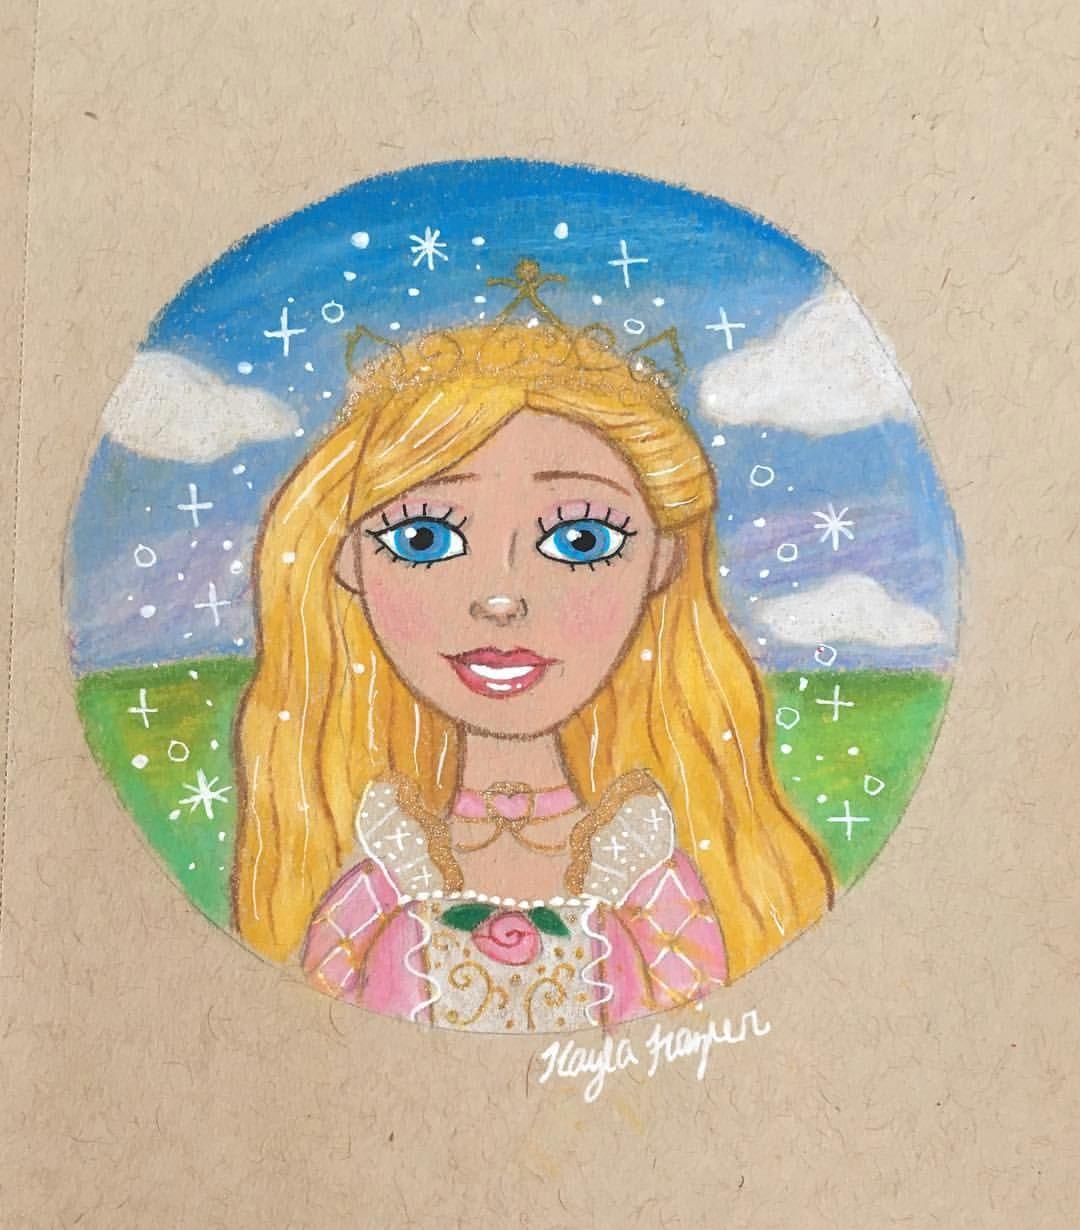 barbie annelise drawing by kayla frazier barbie barbiefanart barbieart princess prismacolor prismacoloredpencils drawing art fanart girl